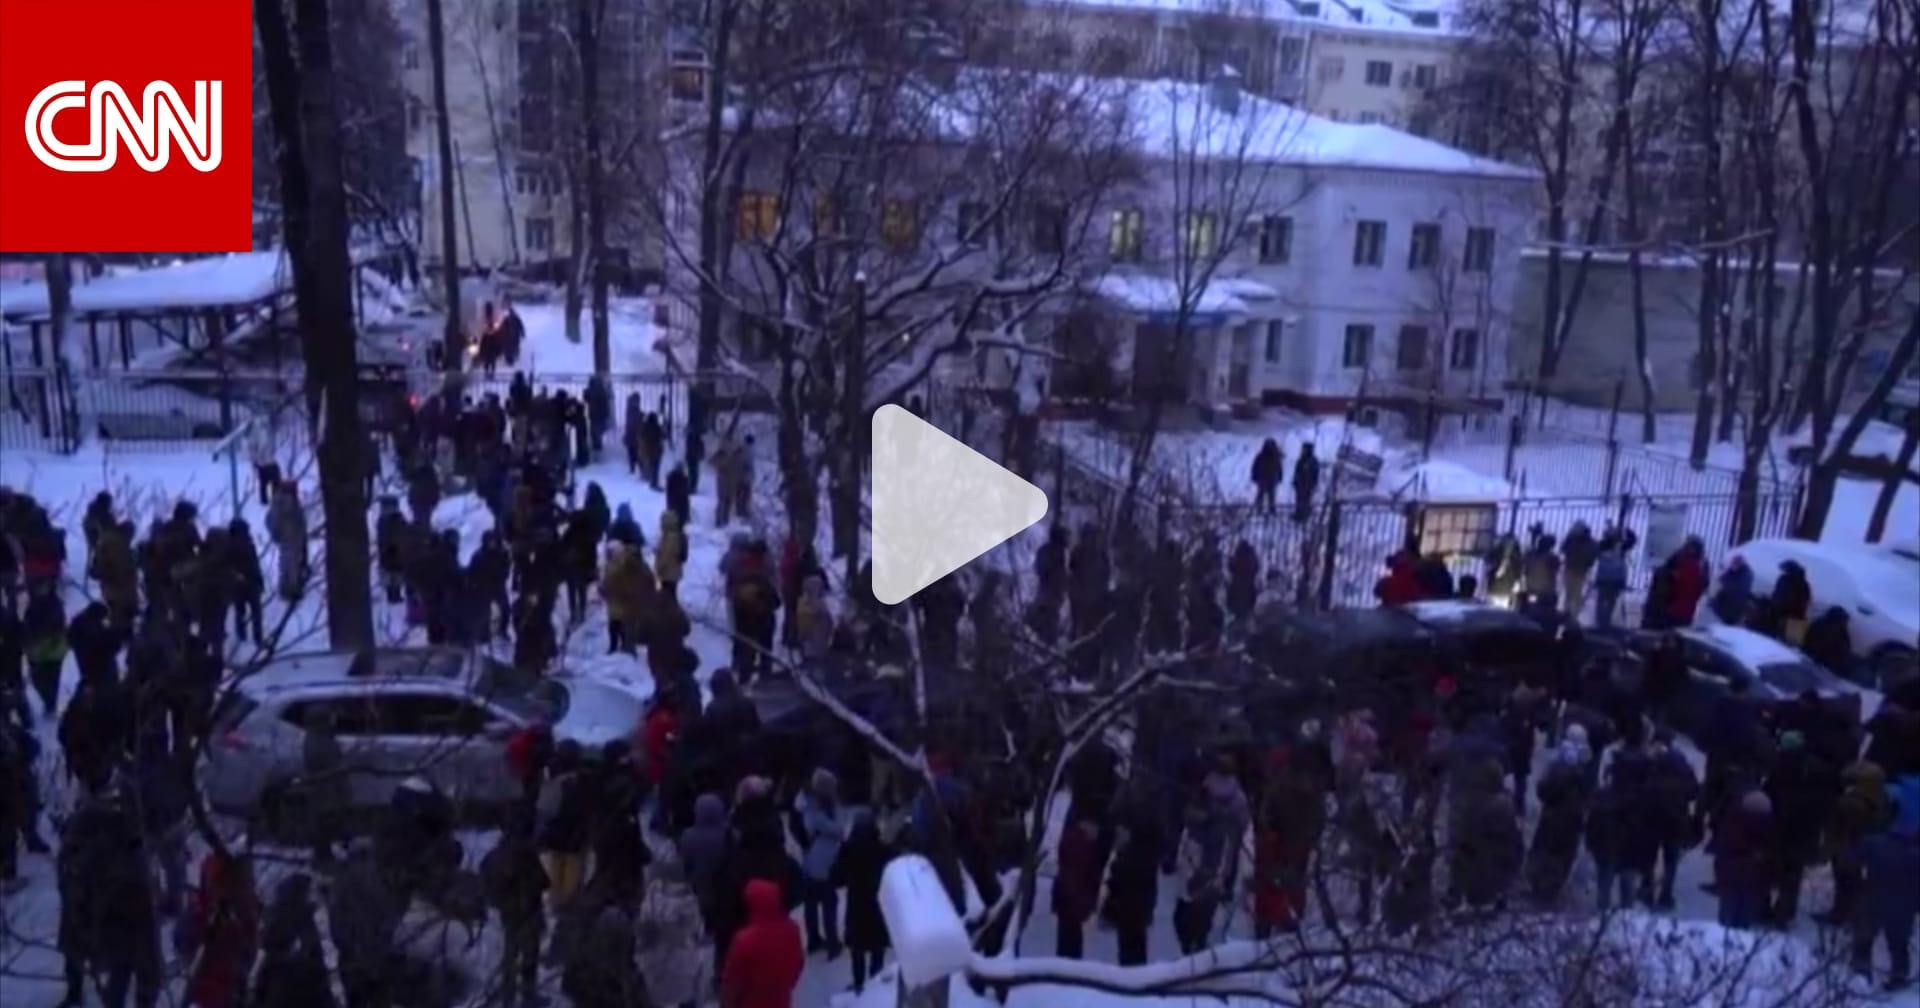 اندلاع مظاهرات خارج مركز شرطة بموسكو بعد اعتقال نافالني